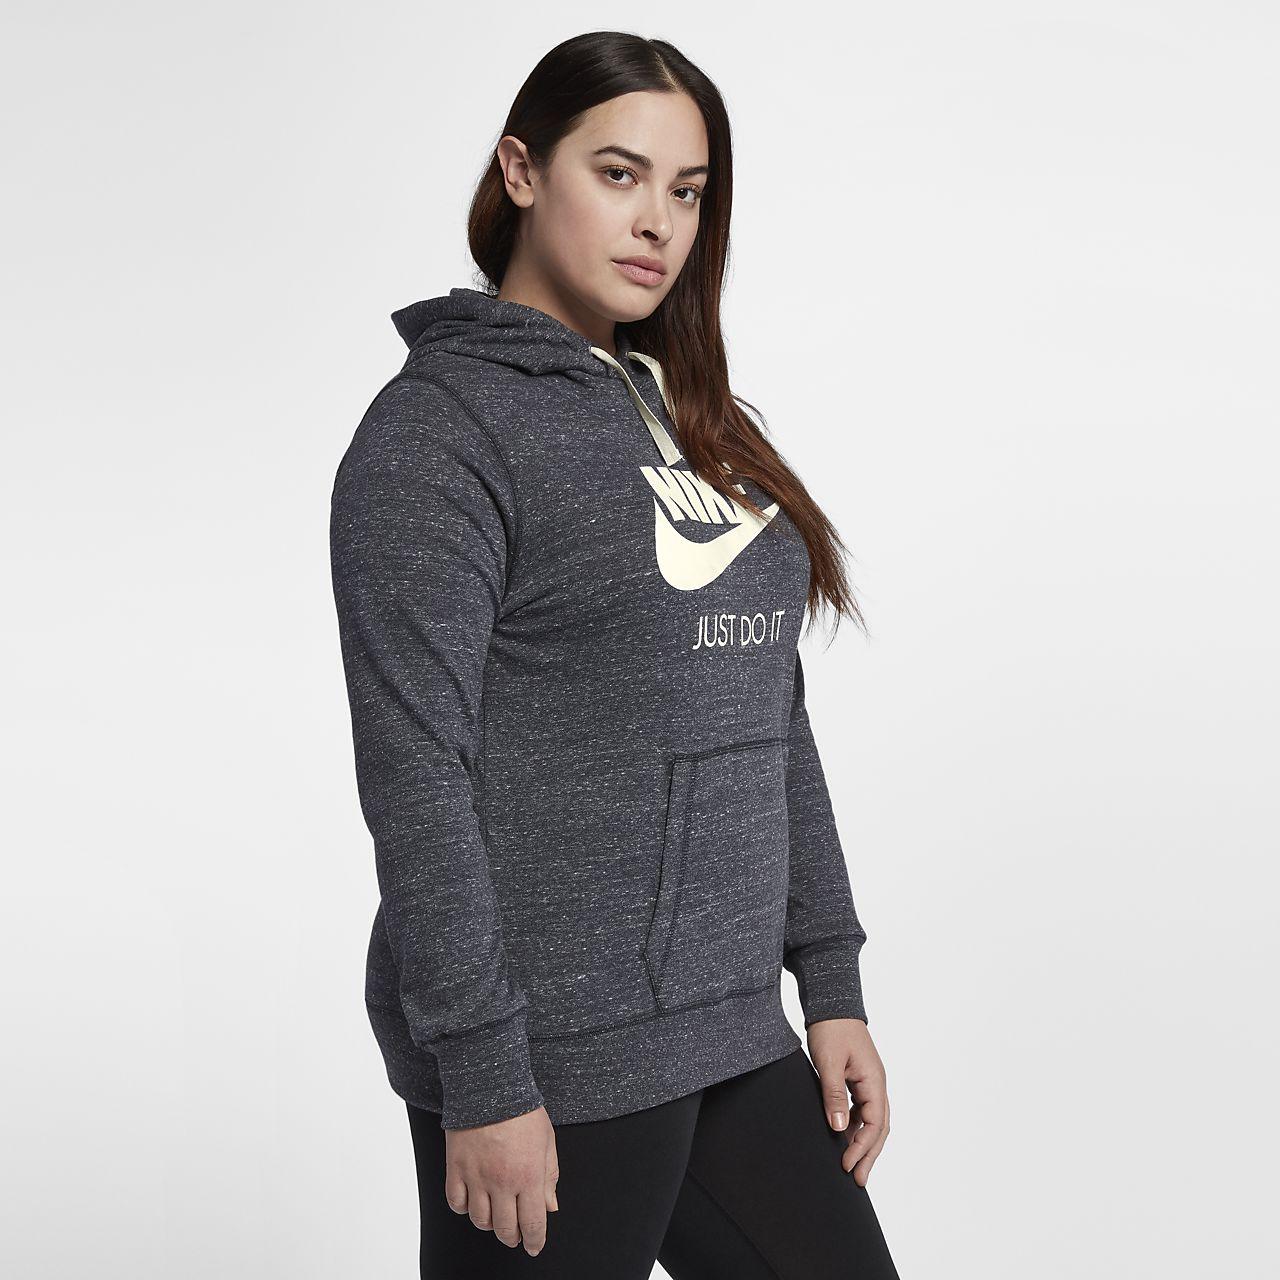 Sudadera con capucha para mujer Nike Sportswear Gym Vintage (Talla grande)